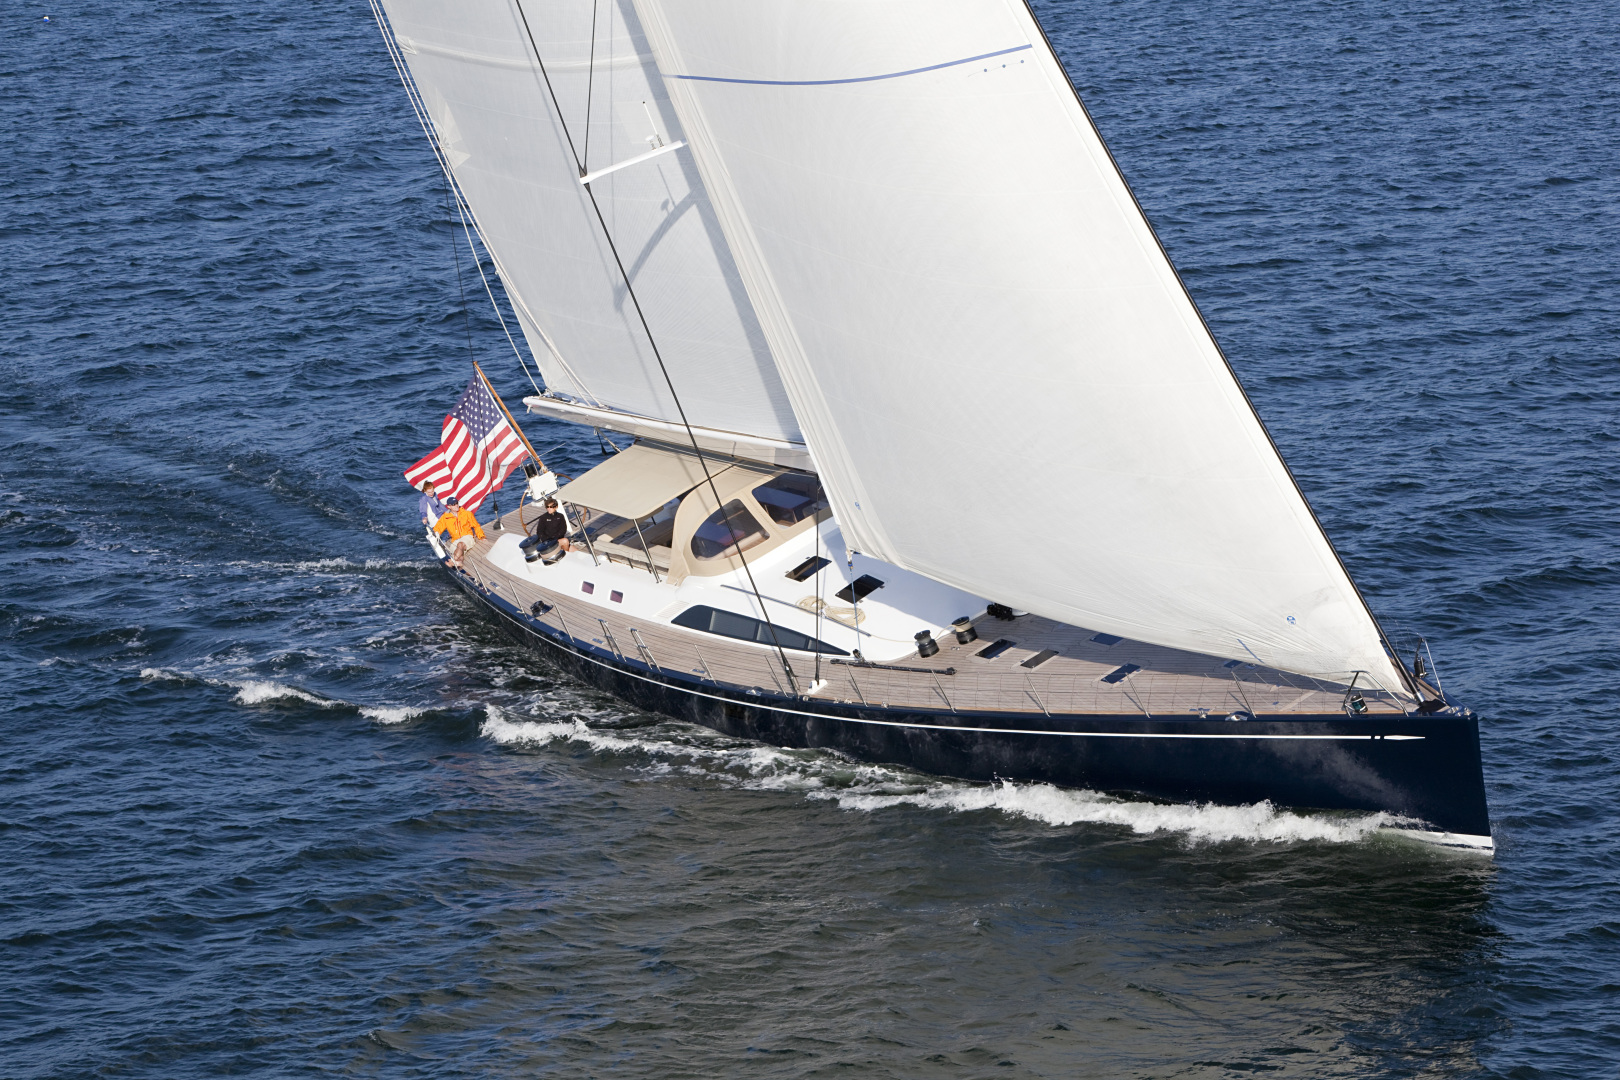 VIRAGO-yacht-for-sale-for-charter-vbs-01.jpg